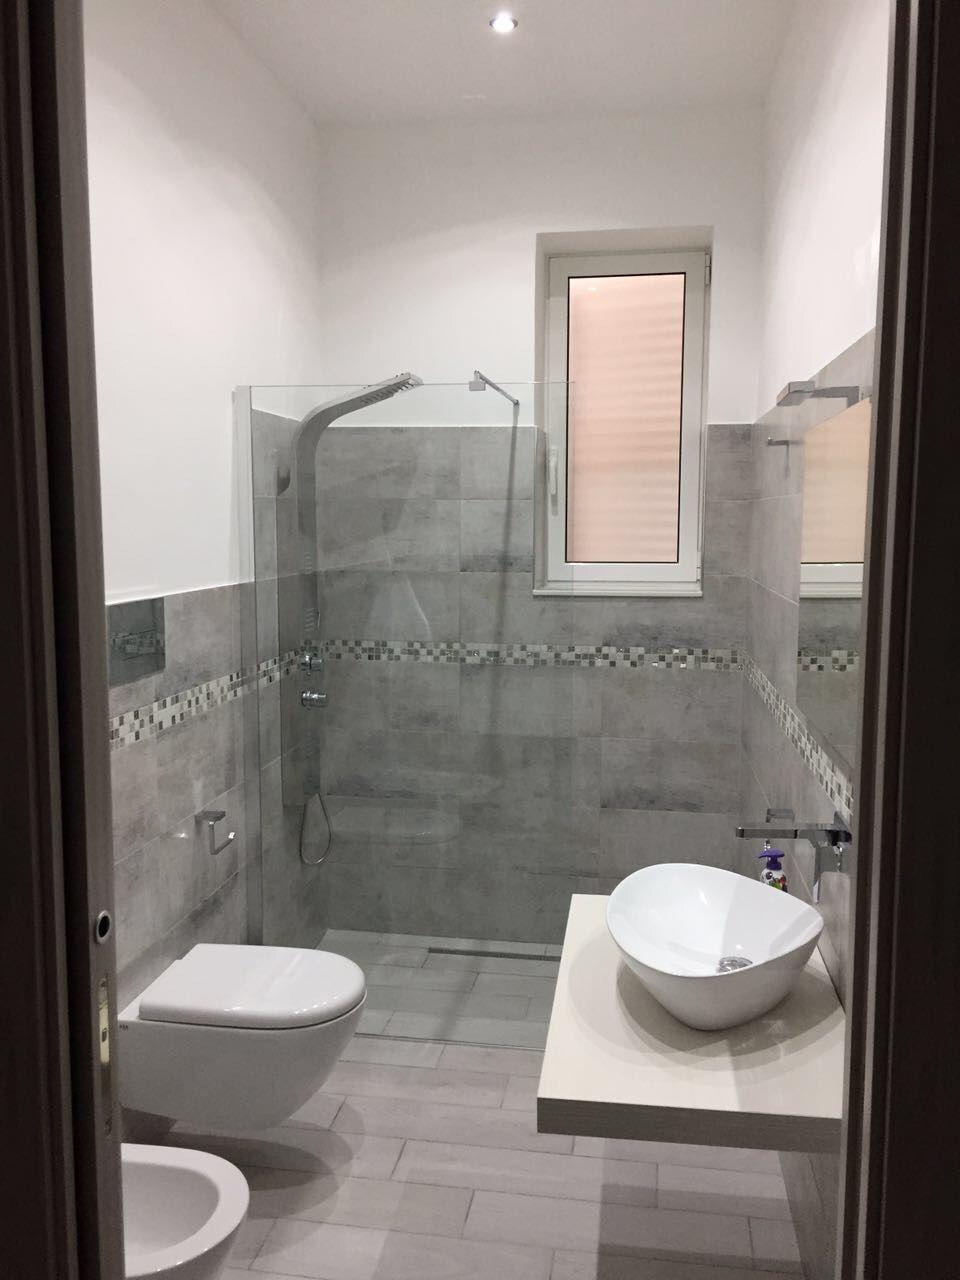 Bagno moderno grigio bianco mosaico bagno pinterest house - Bagno moderno mosaico ...